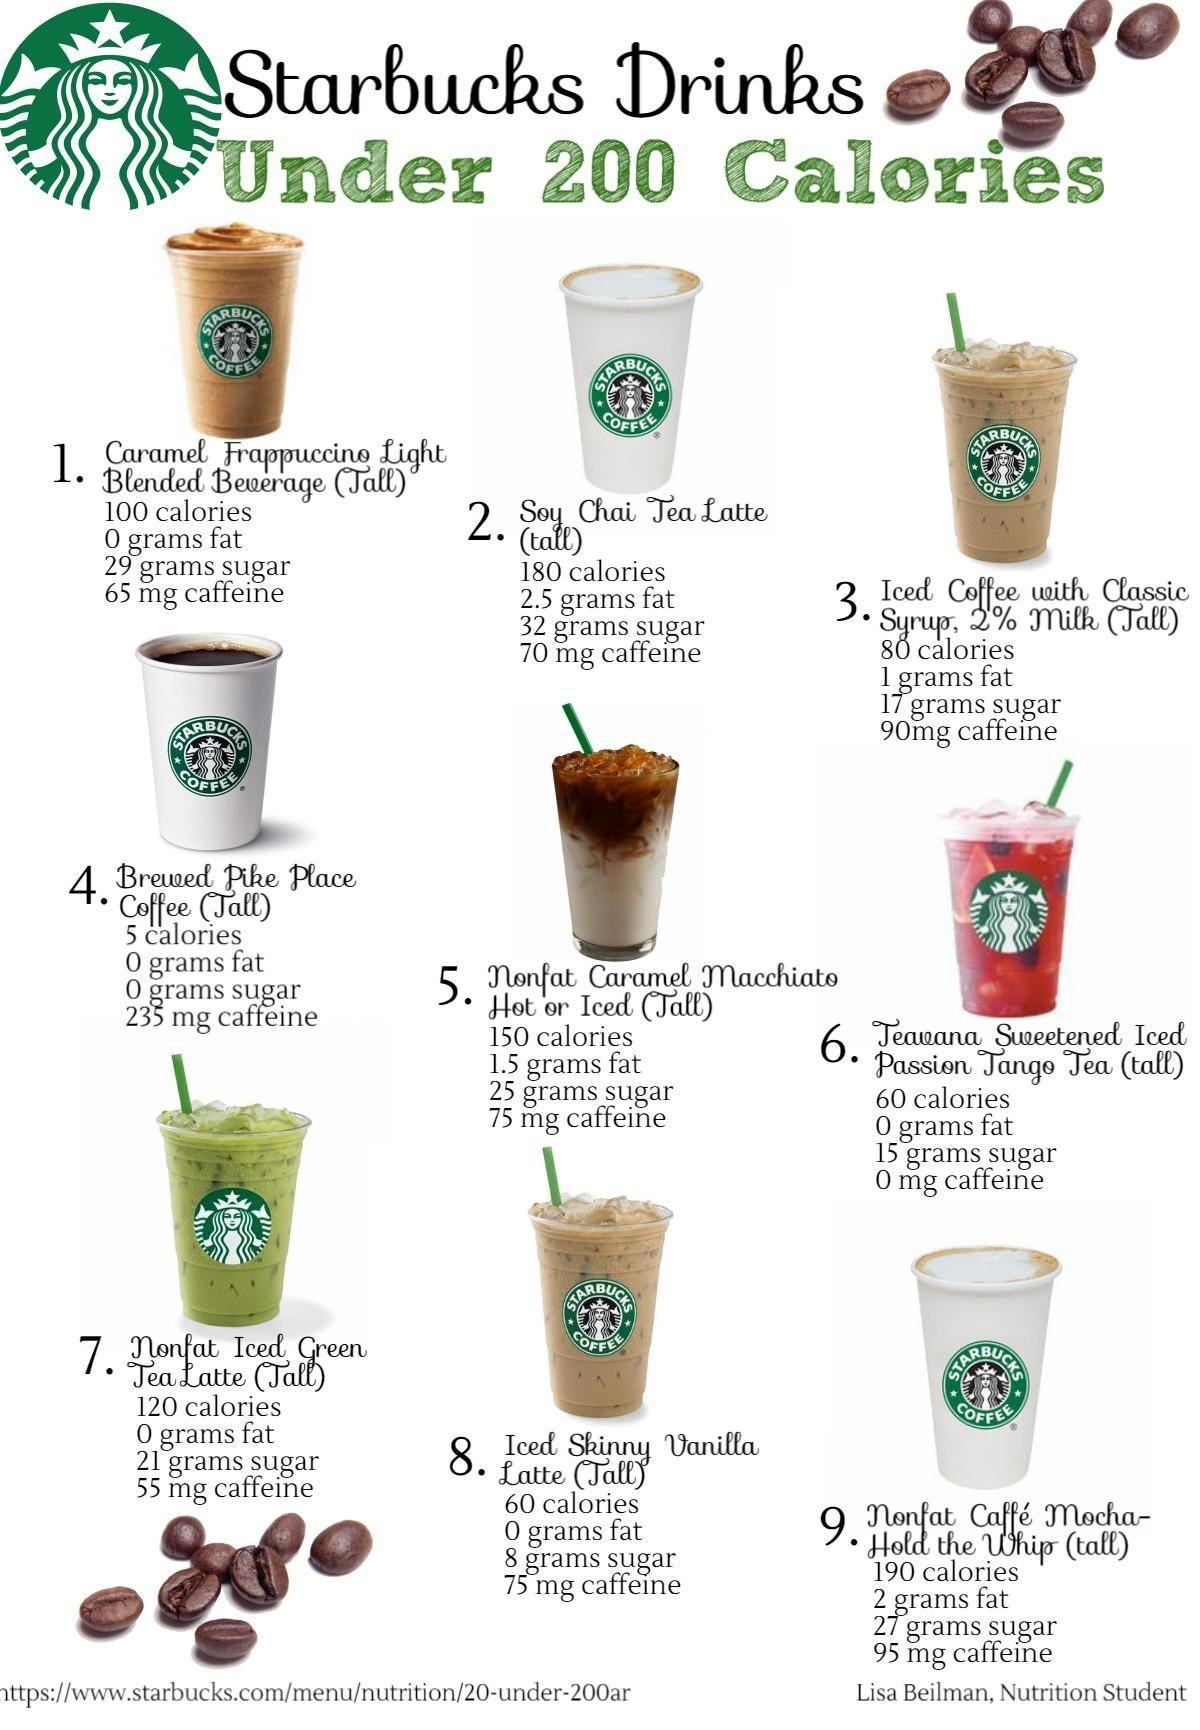 8 Top Cool Ideas Coffee Date Table Coffee Cafe Book Turkish Coffee Mug Coffee Date Favorite Things Healthy Starbucks Starbucks Drinks Recipes Starbucks Drinks